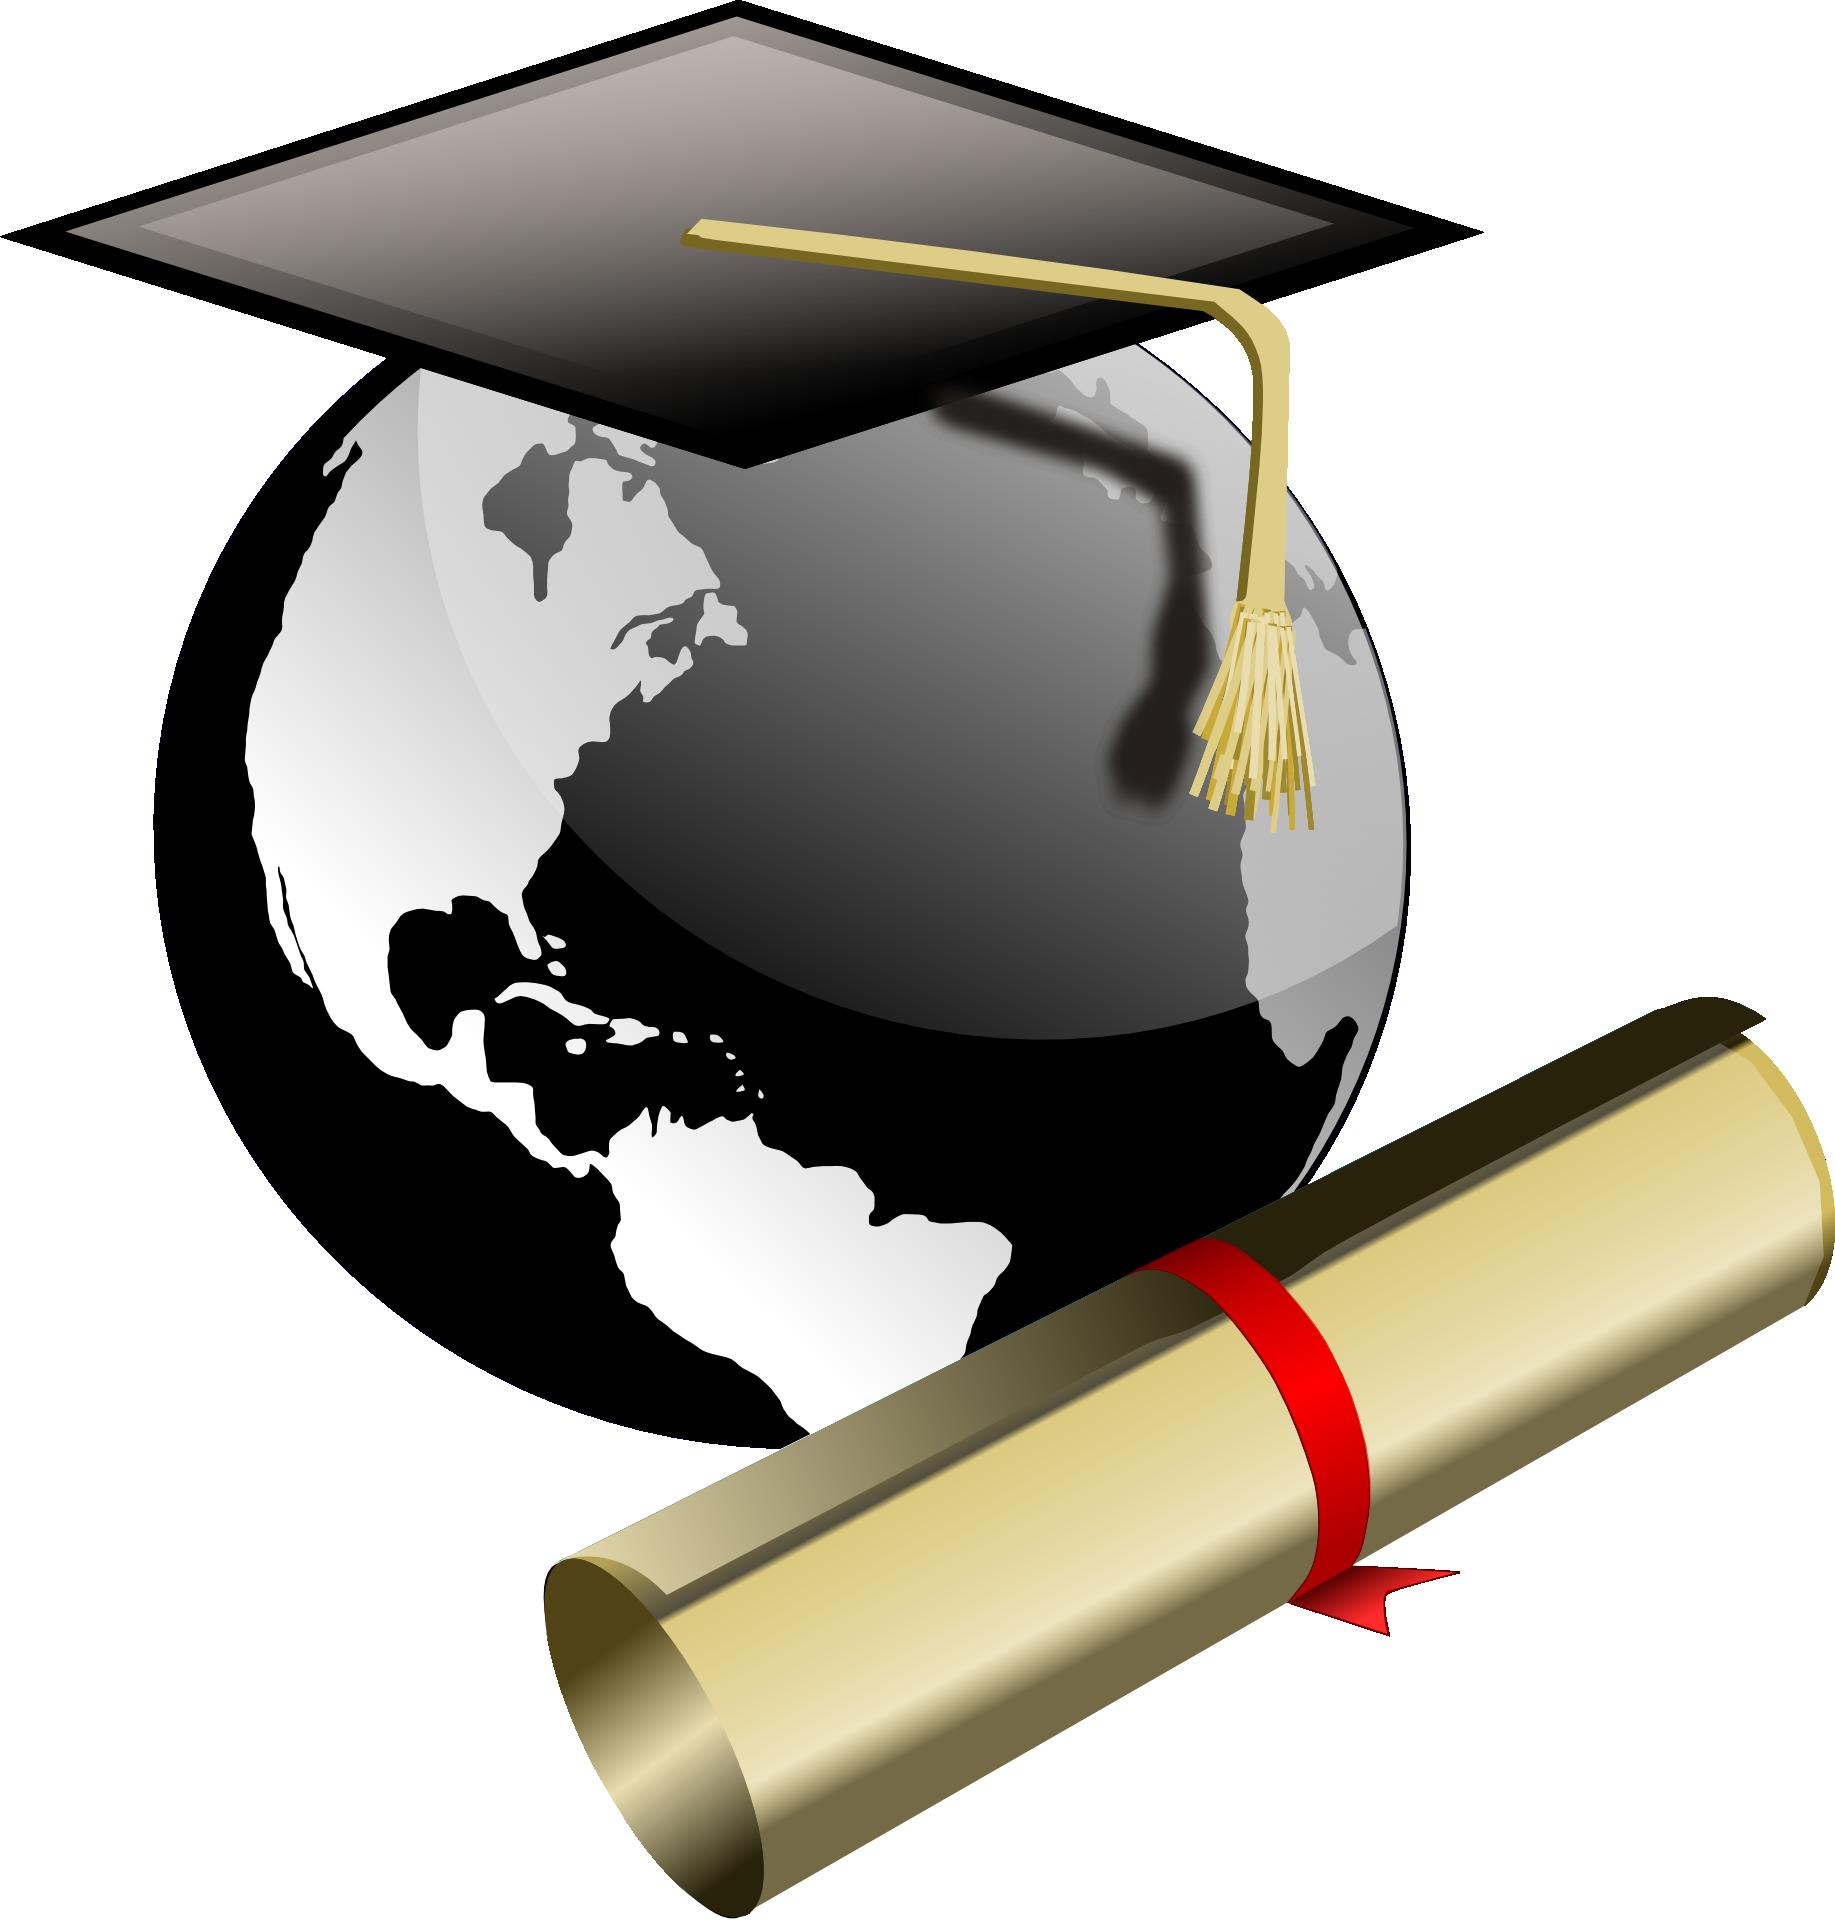 What New Skills Will Graduates Require in the Future?